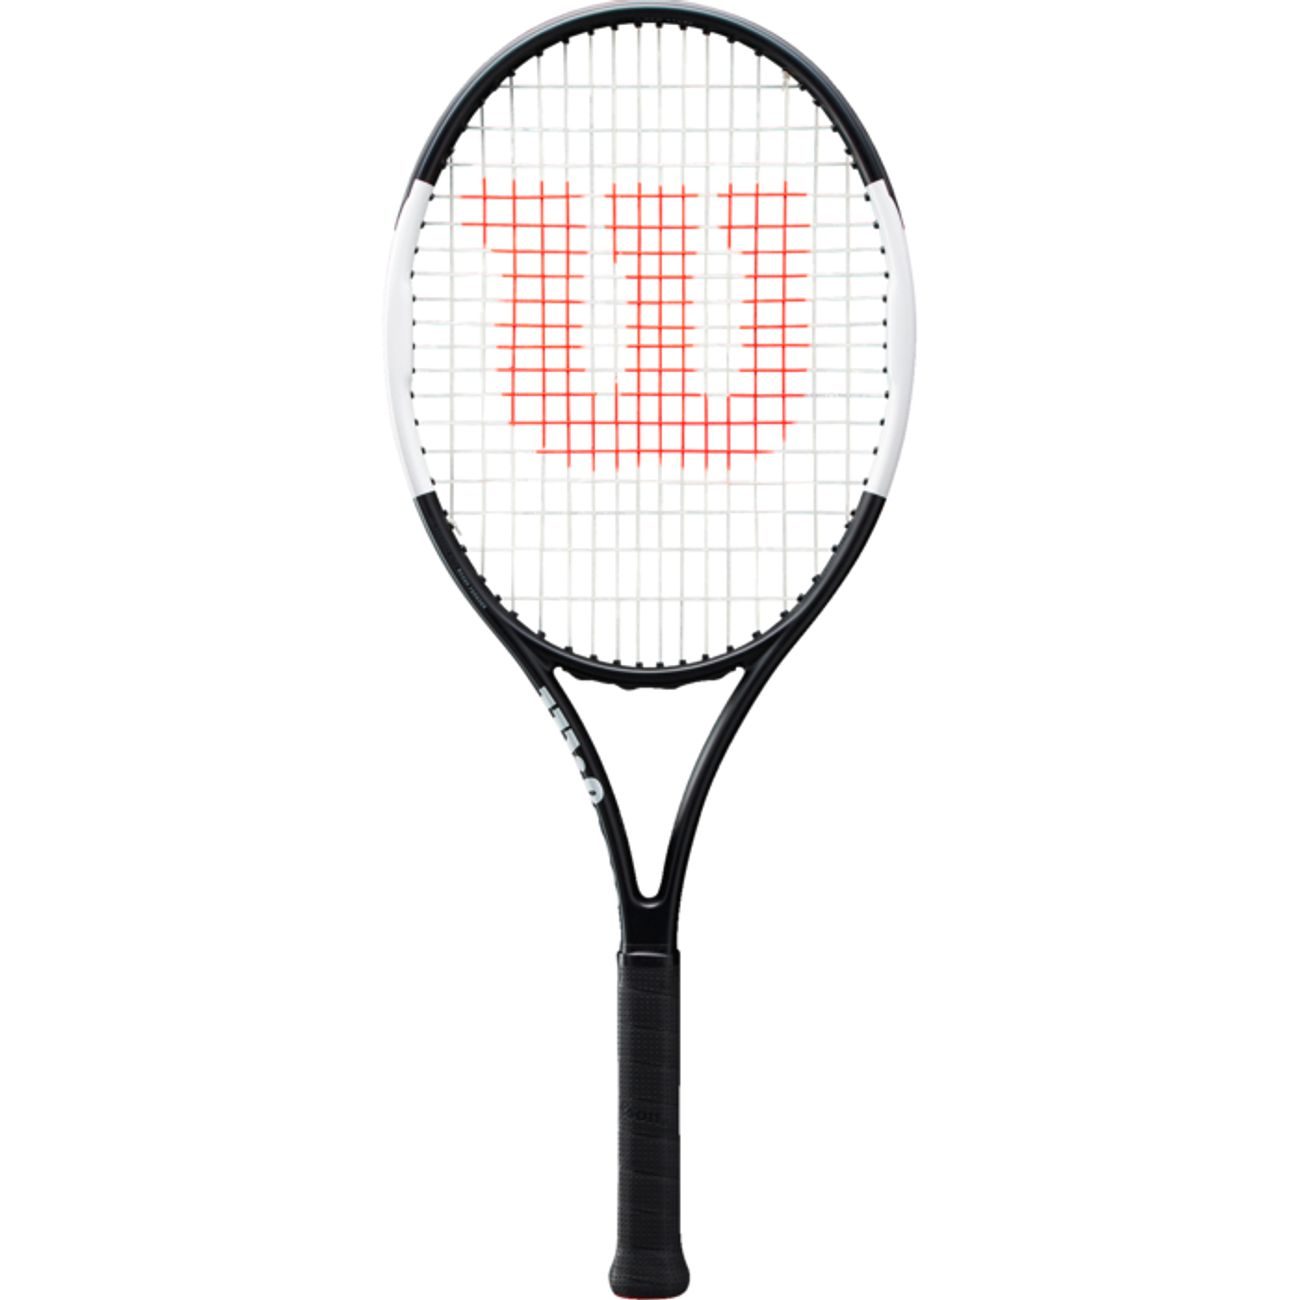 RAQUETTE Tennis junior WILSON PRO STAFF 26